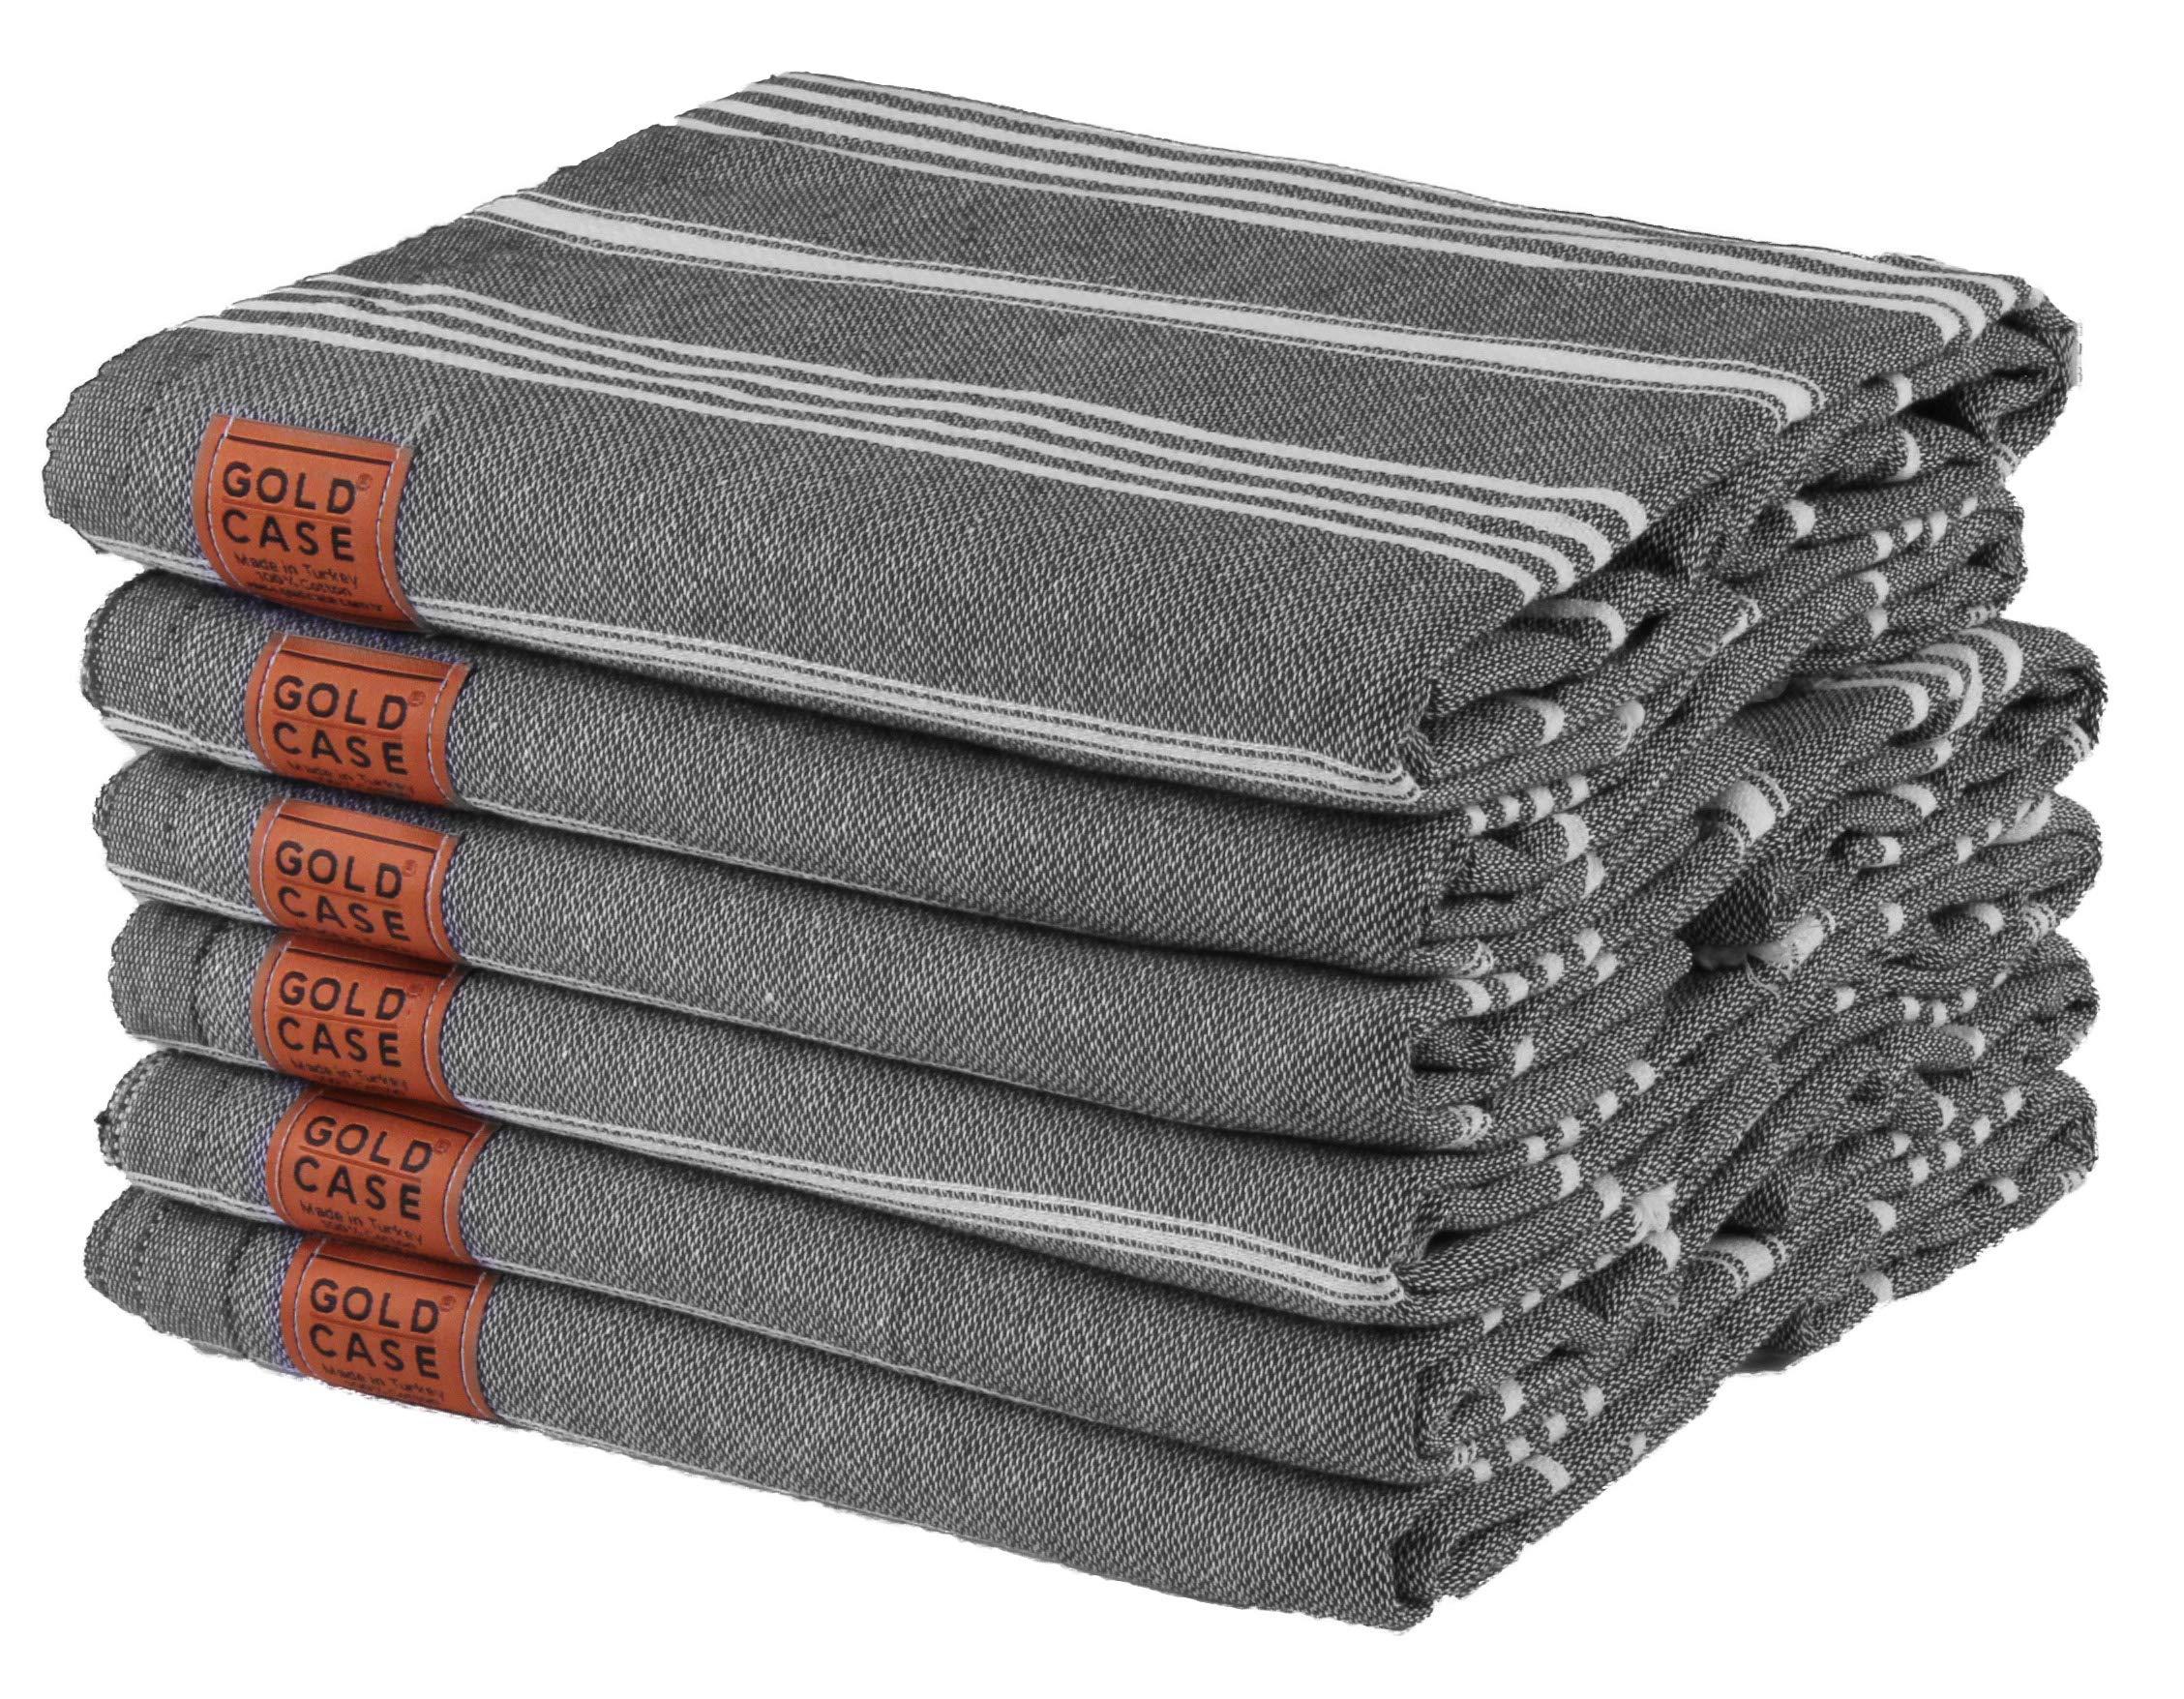 Gold Case Set of 6 XXL Pestemal Towel Turkish Cotton Bath Beach Hammam Towel Peshtemal Throw Blanket (Black) by Gold Case (Image #1)